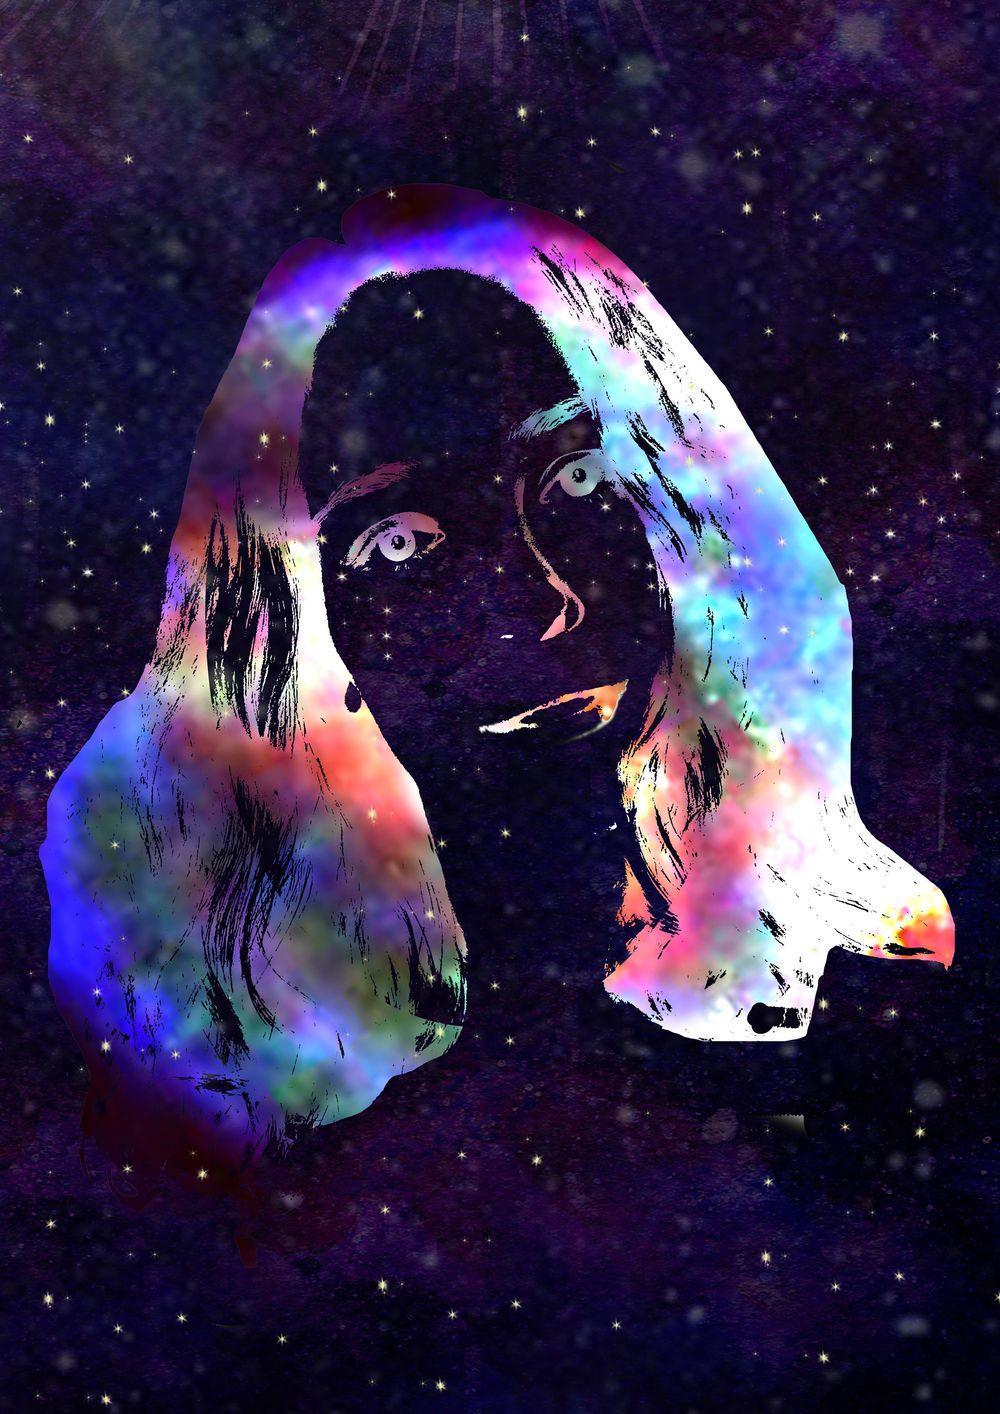 SUPERNOVA - image 2 - student project